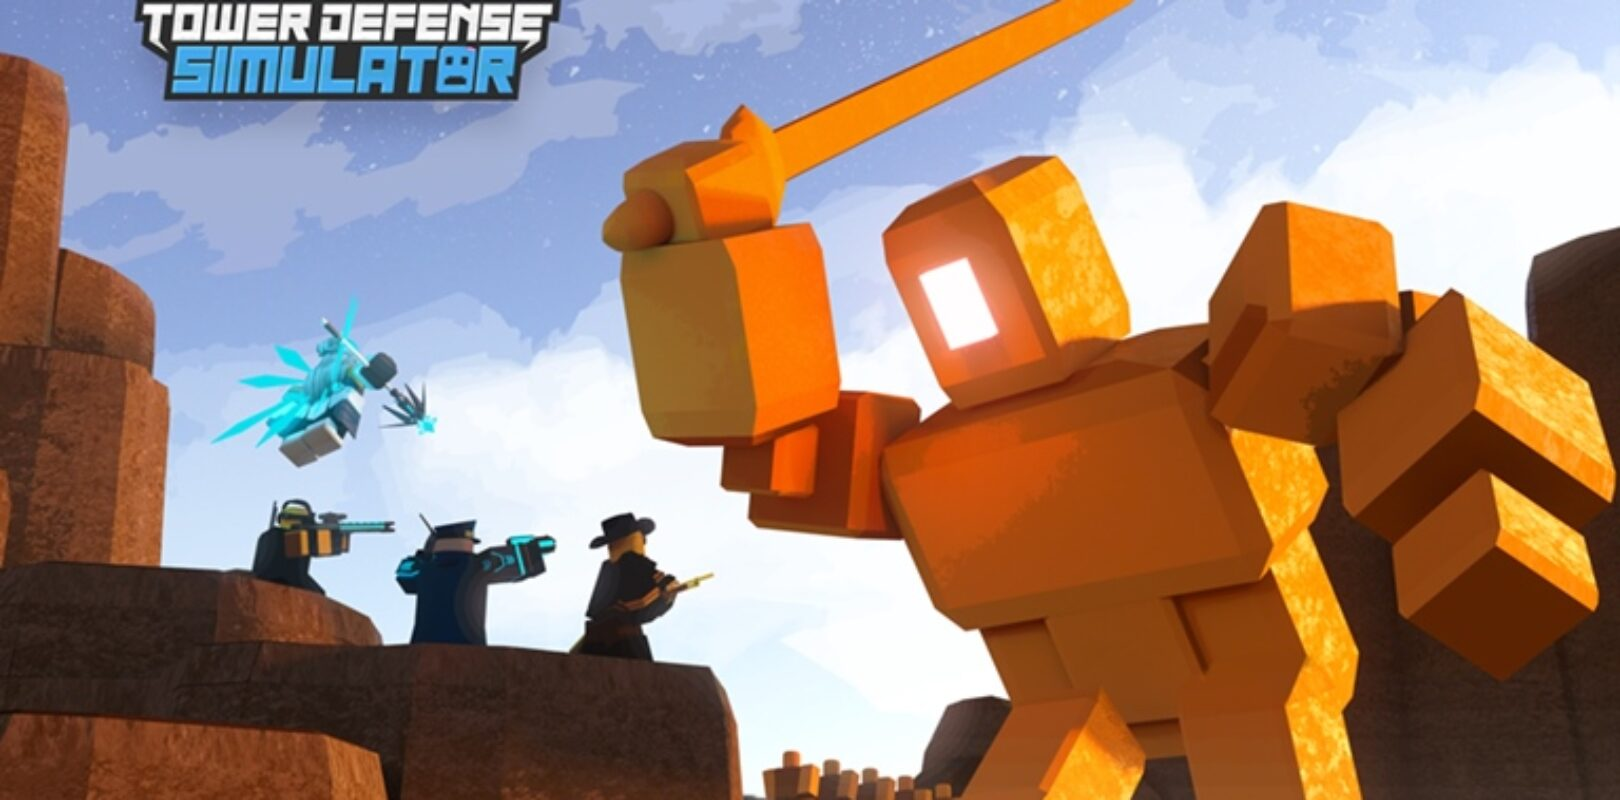 Tower Defense Simulator Codes 2020 Pivotal Gamers